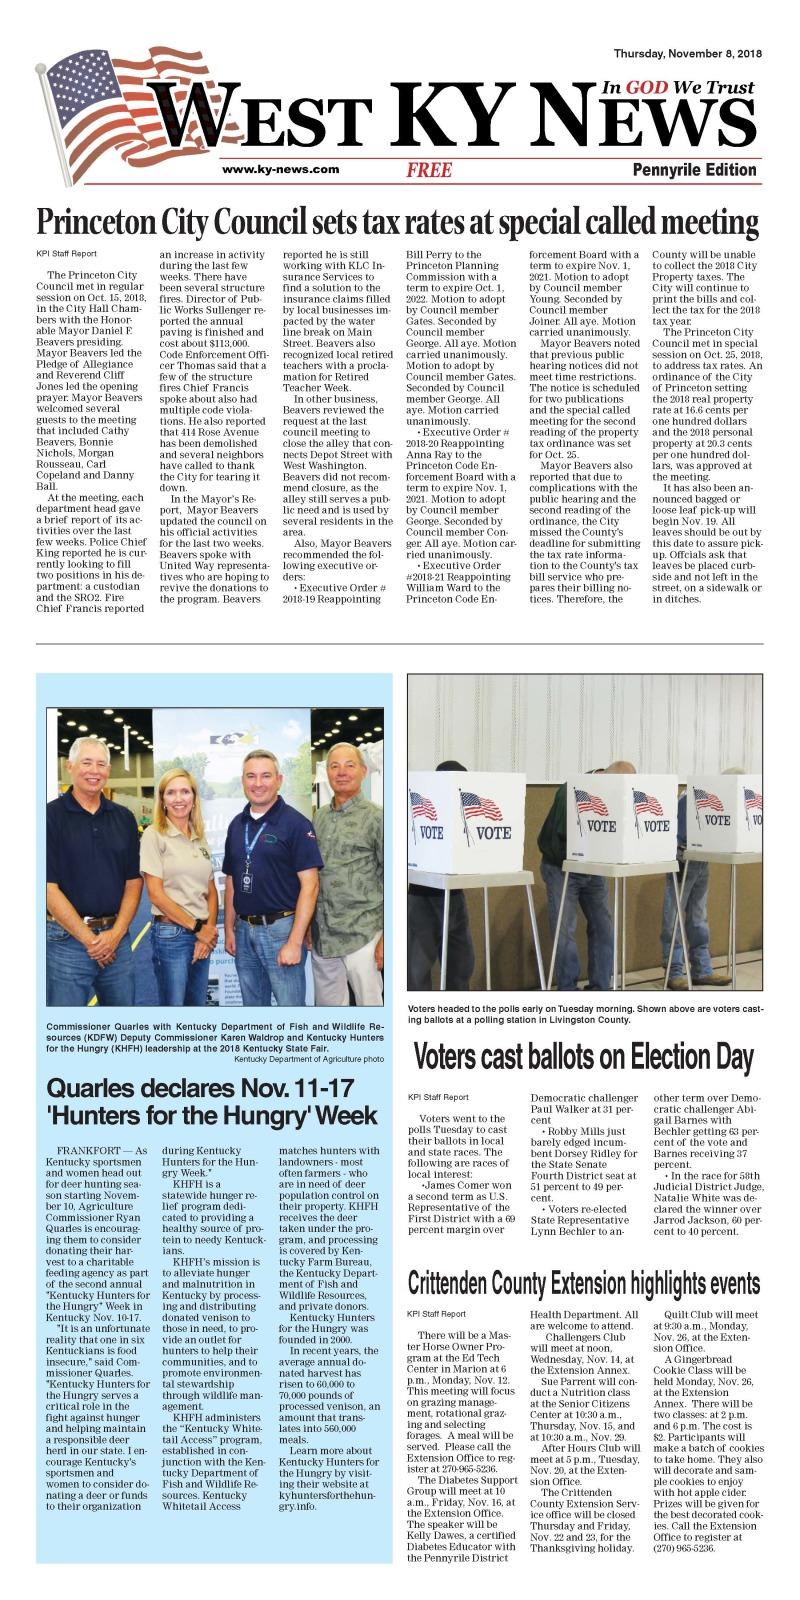 West KY News: Pennyrile Edition 11-8-18